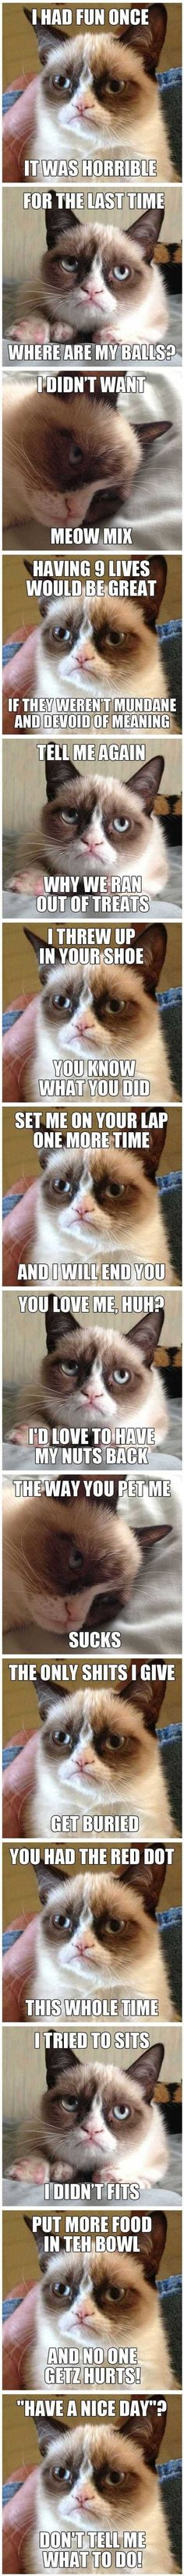 Grumpy Cat Compilation